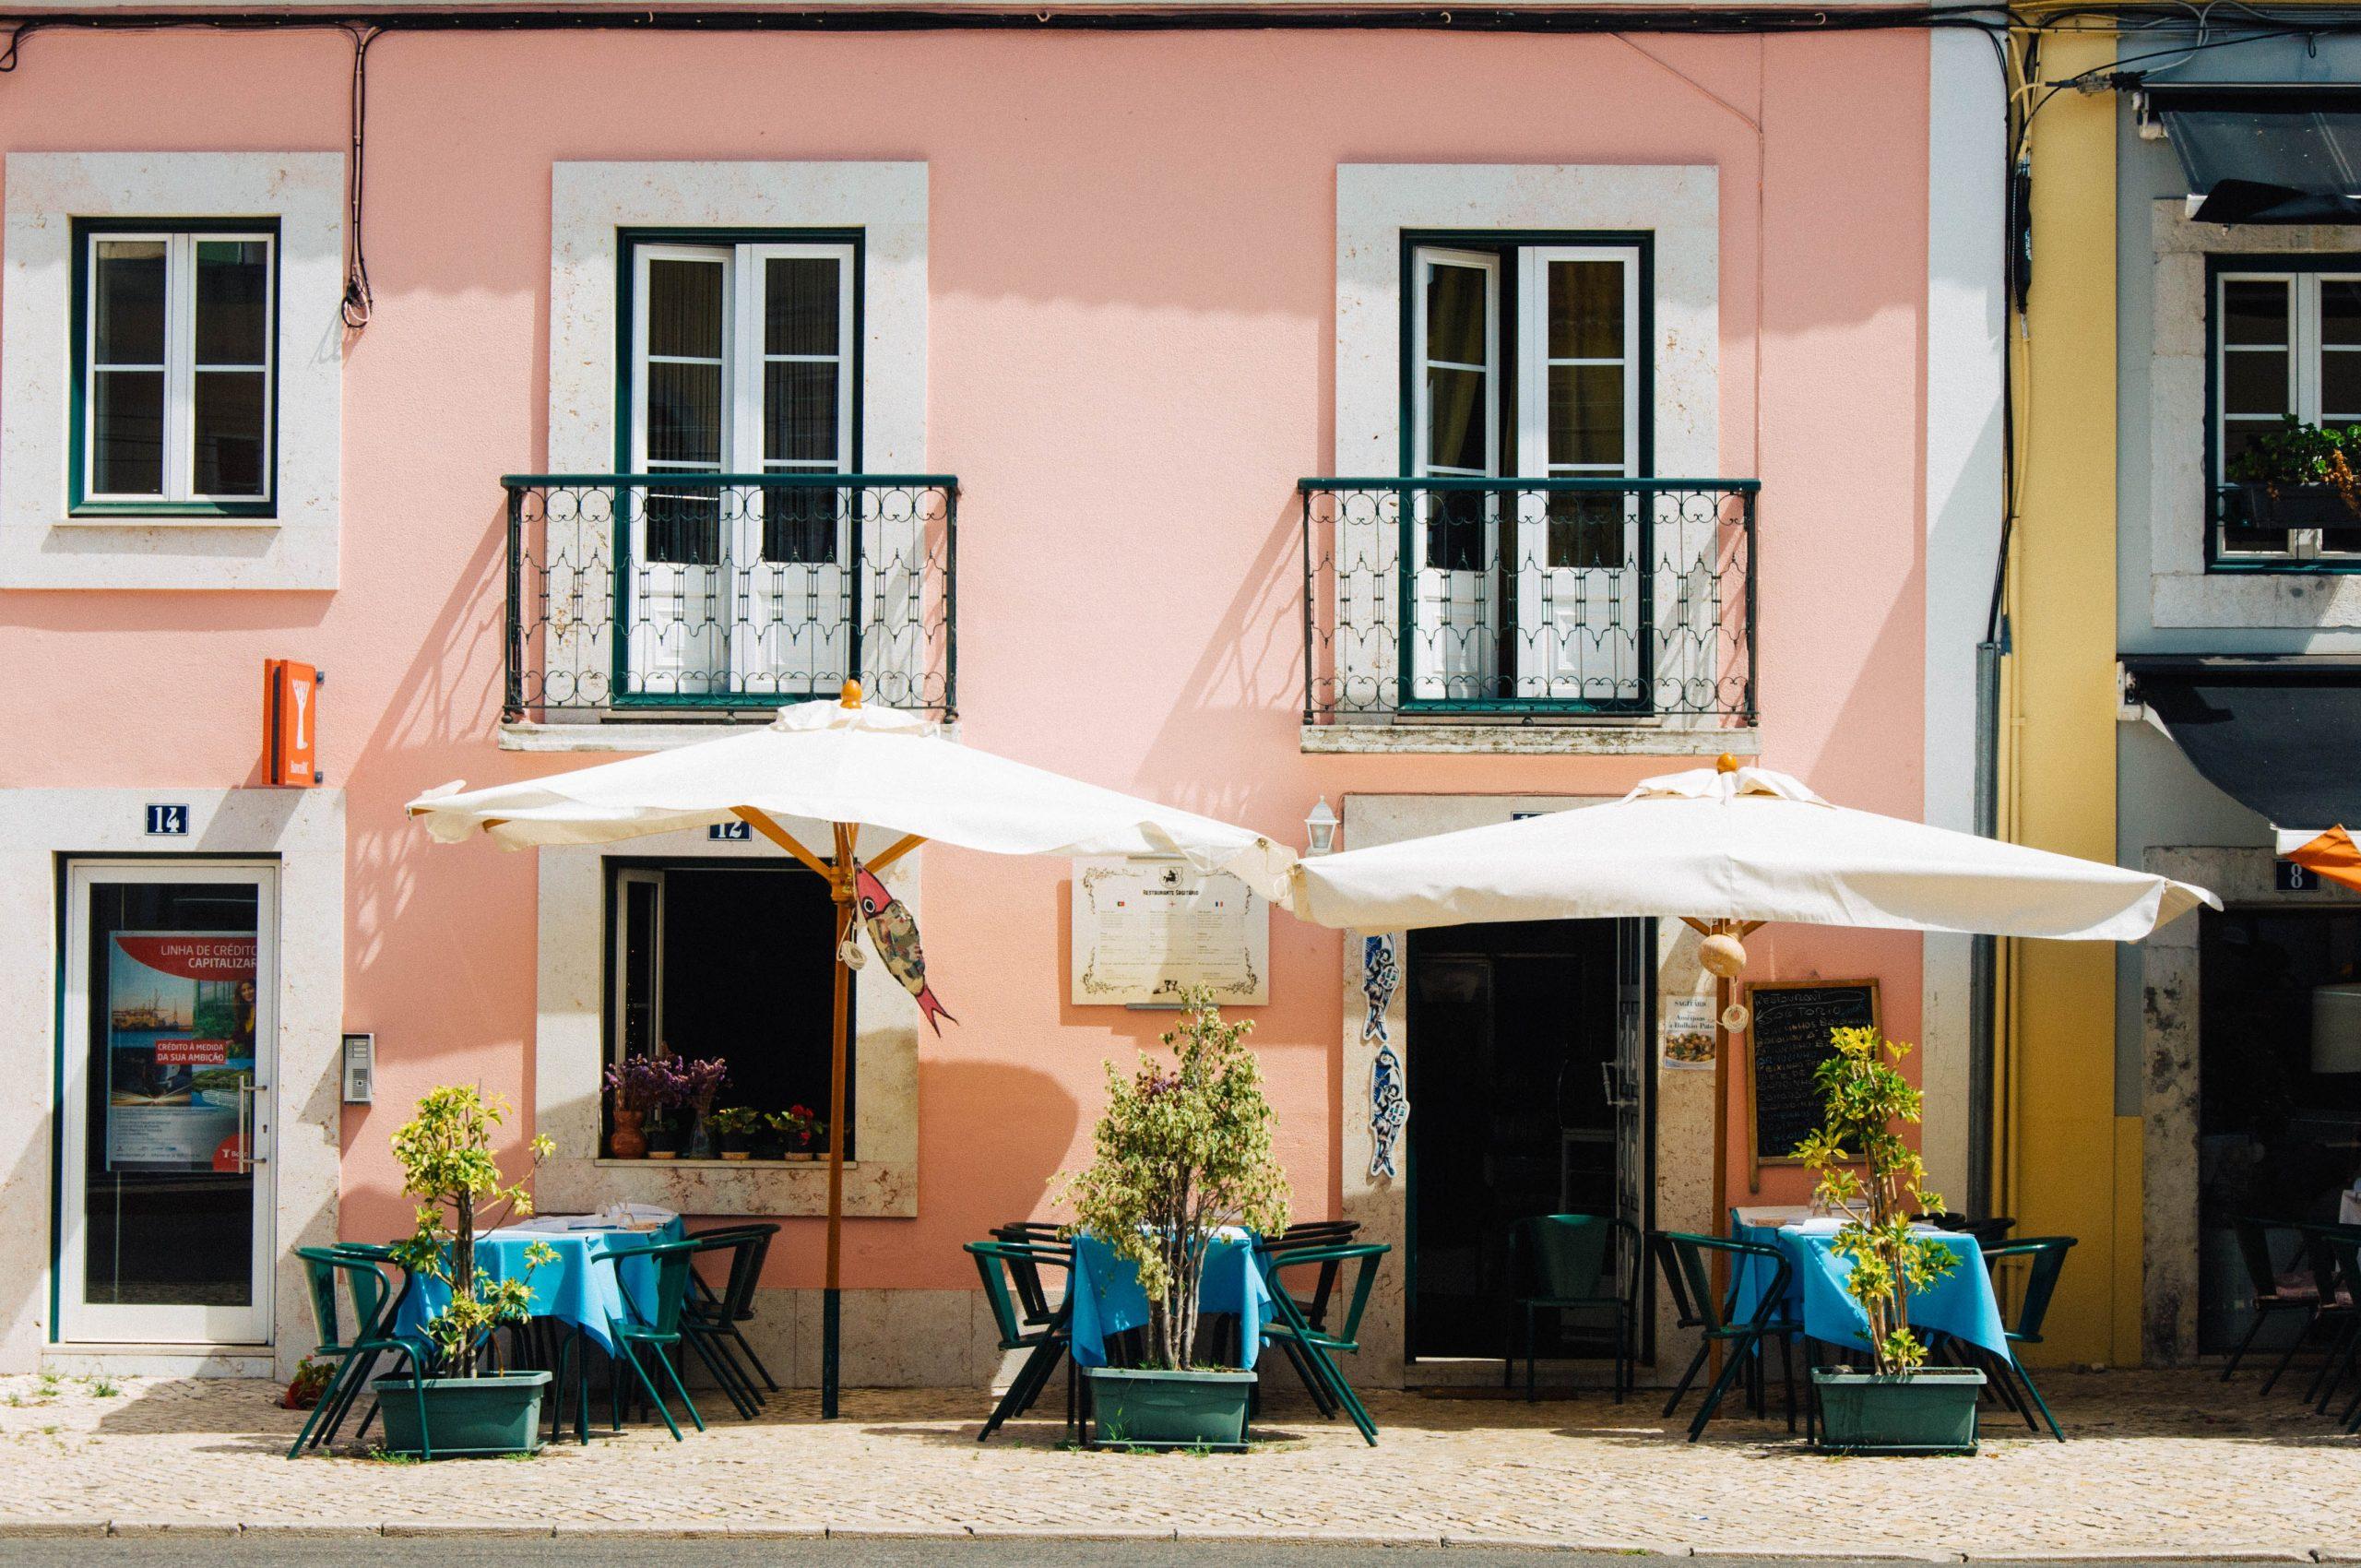 Reise nach Portugal - Photo by Clifford on Unsplash